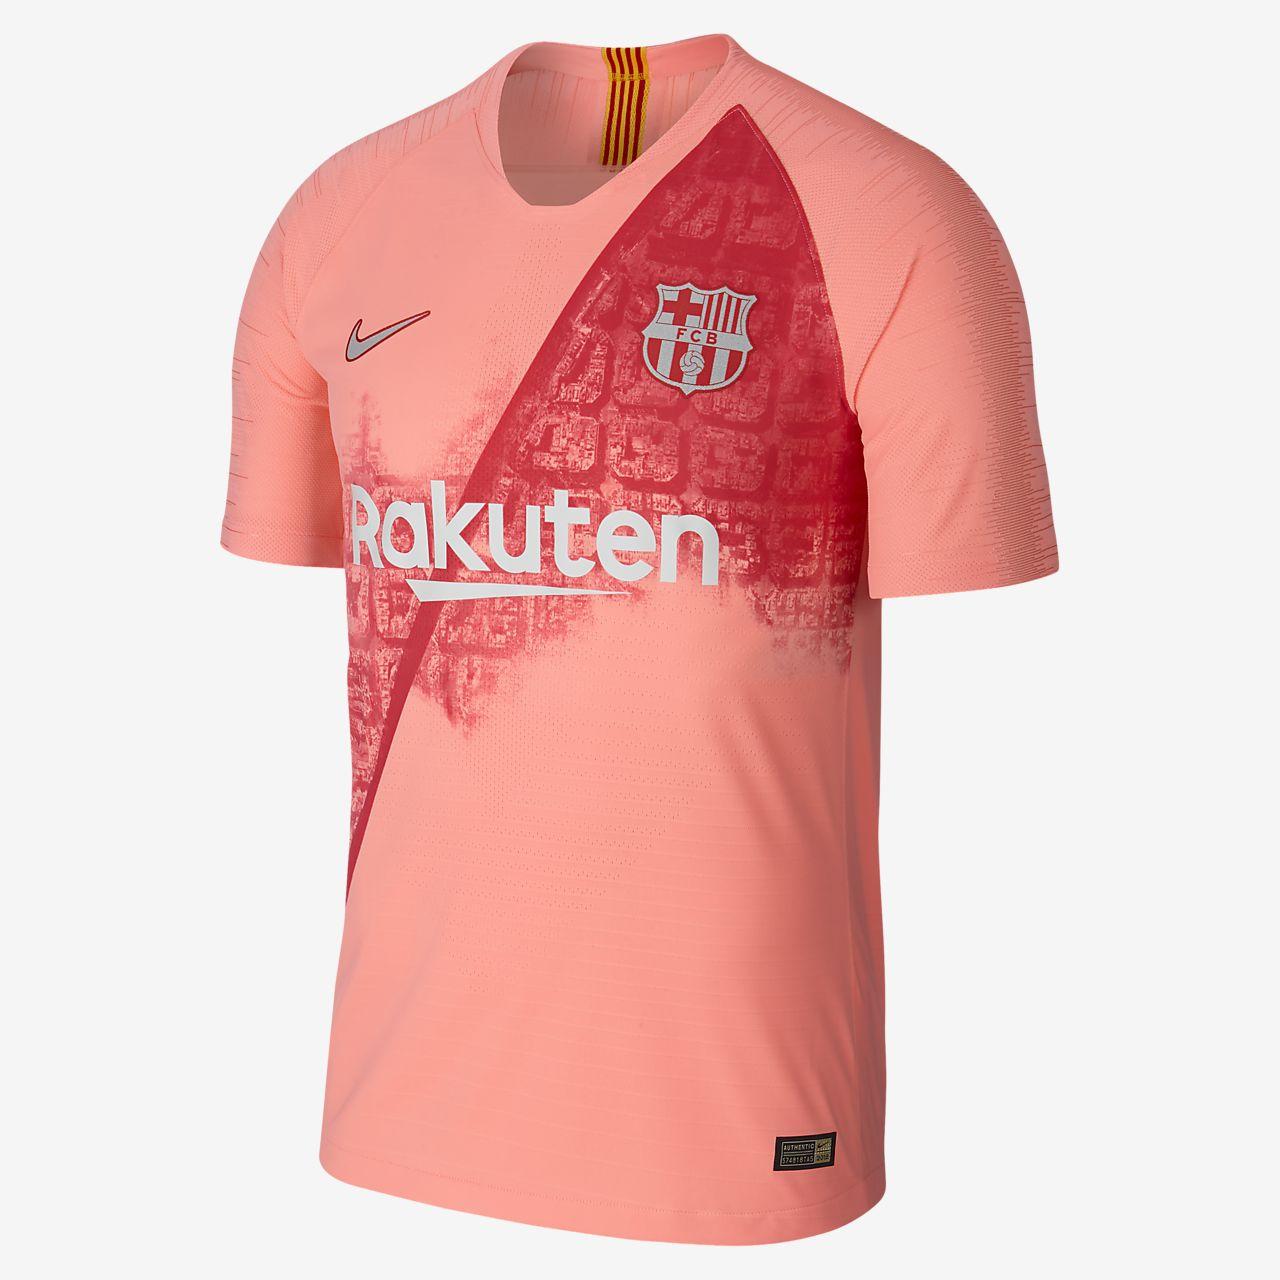 ff71cb3772dfa ... Camiseta de fútbol para hombre alternativa Vapor Match del FC Barcelona  para la temporada 2018